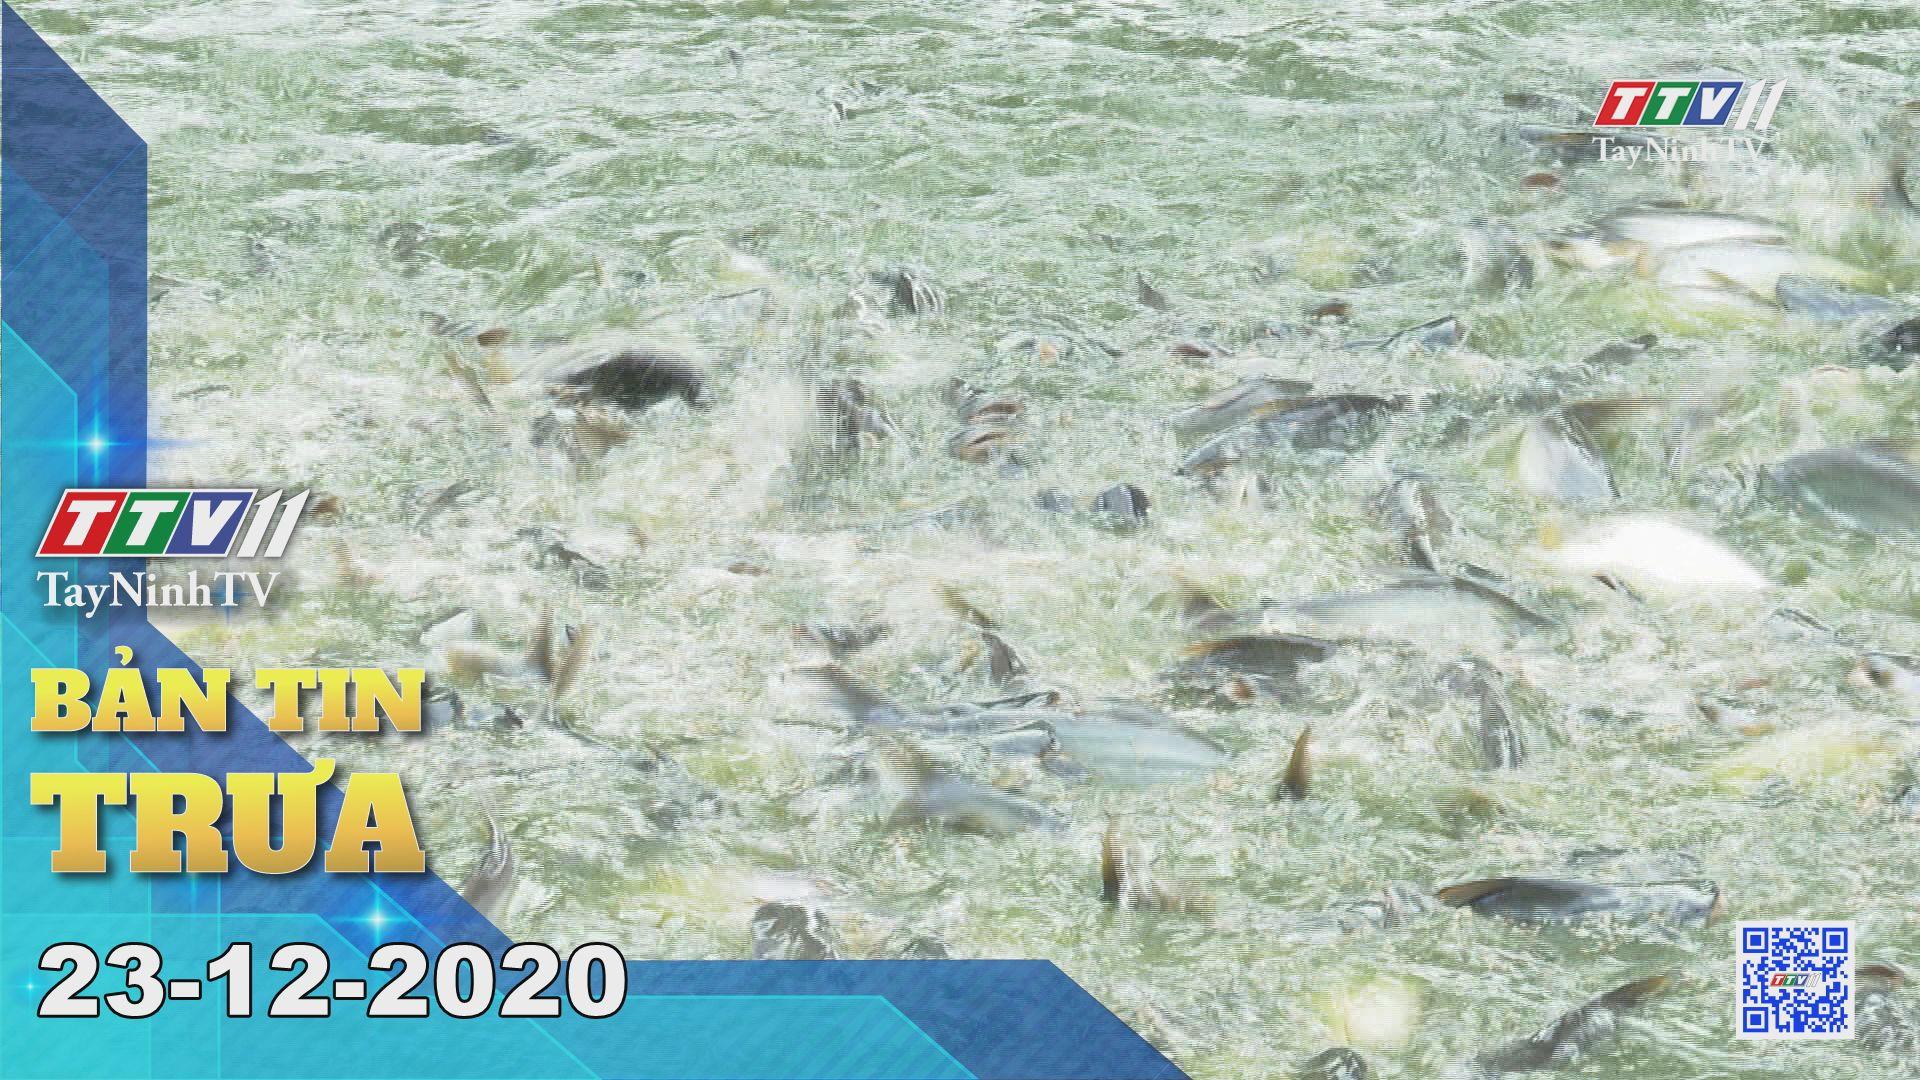 Bản tin trưa 23-12-2020 | Tin tức hôm nay | TayNinhTV